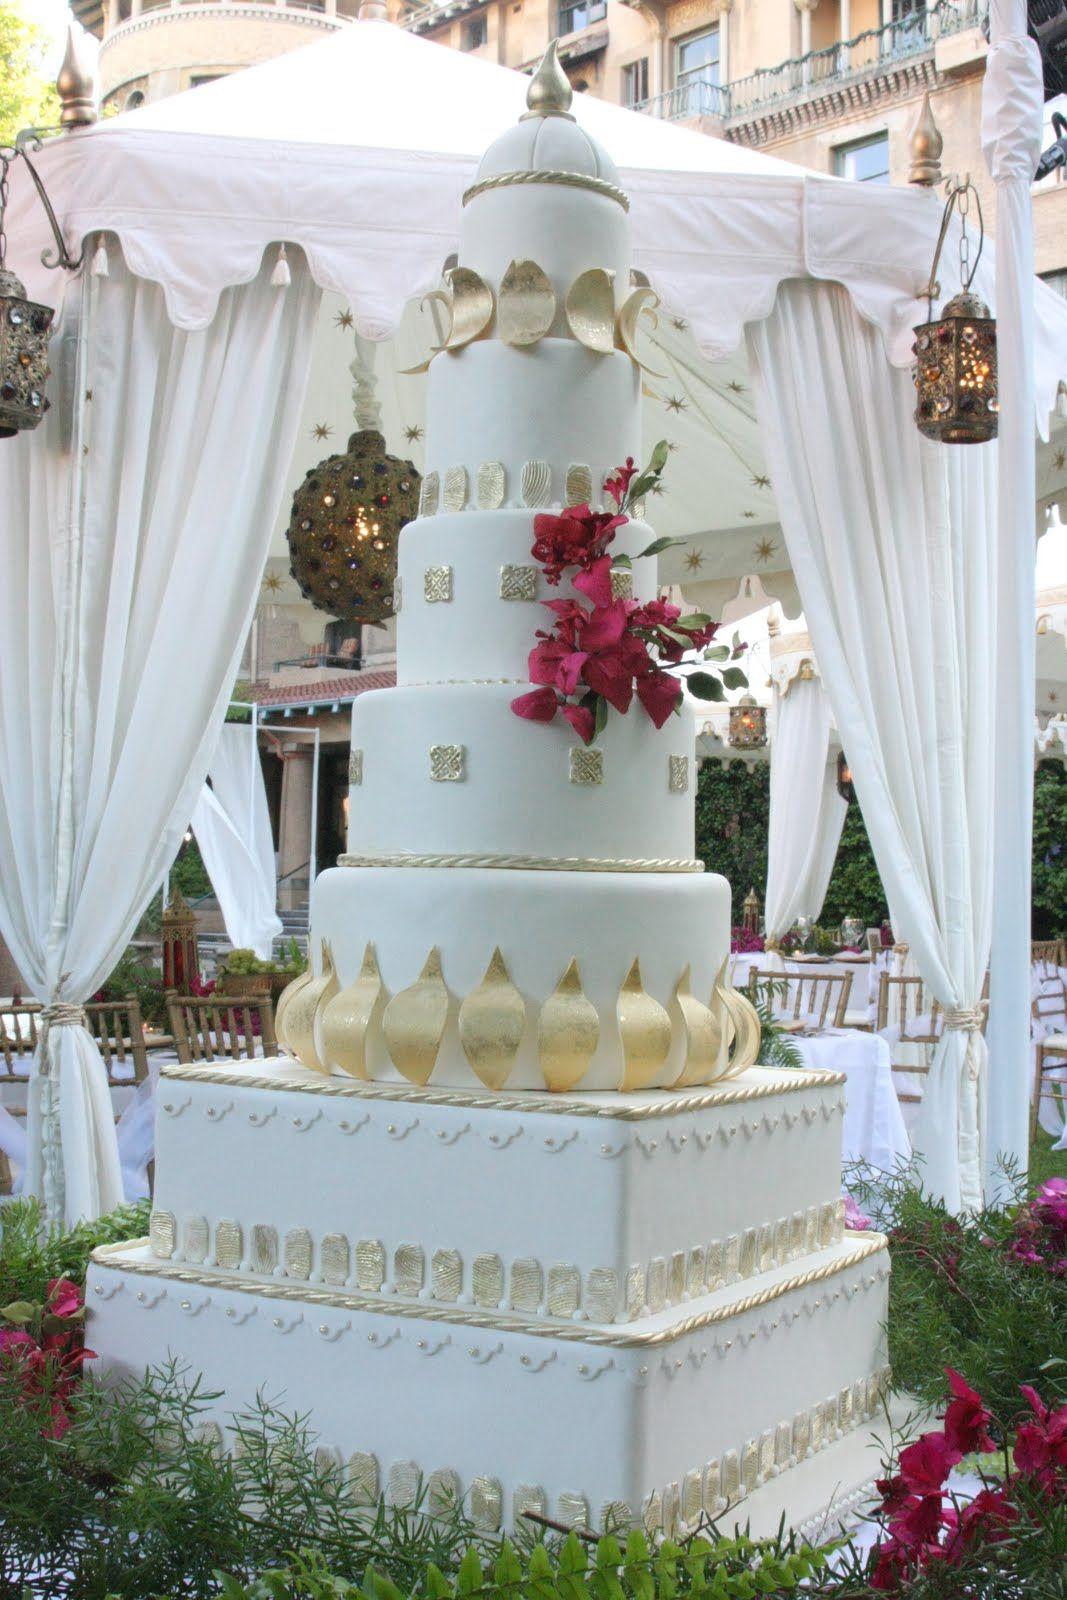 Grecian Wedding Theme The Wedding Theme Was Grecianmediterranean